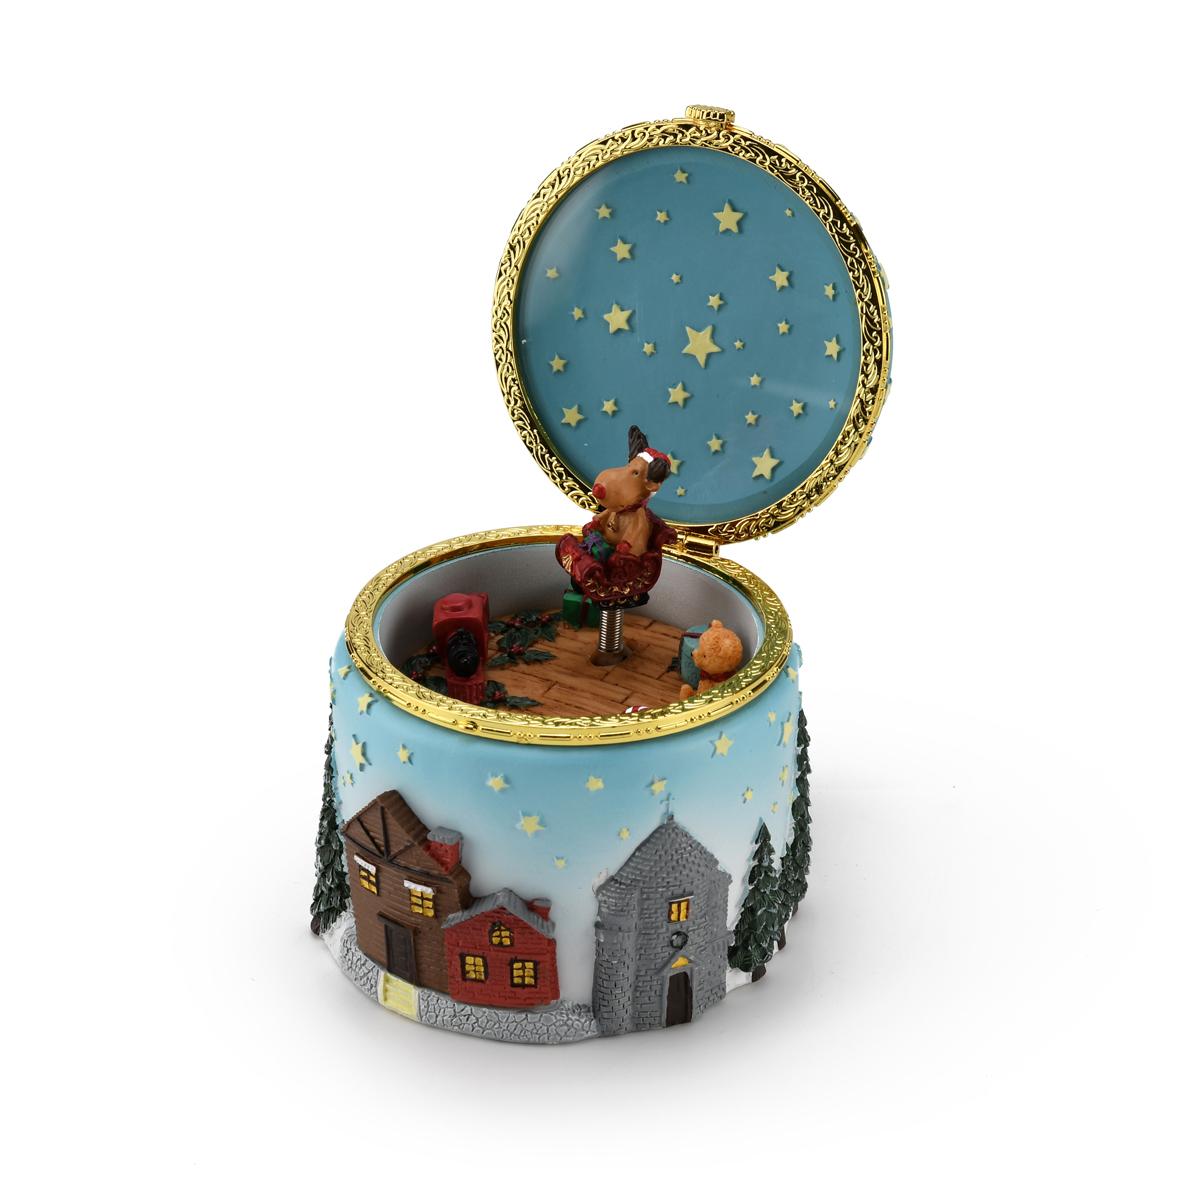 Joyful and Festive Christmas Themed Animated Musical Trinket Keepsake